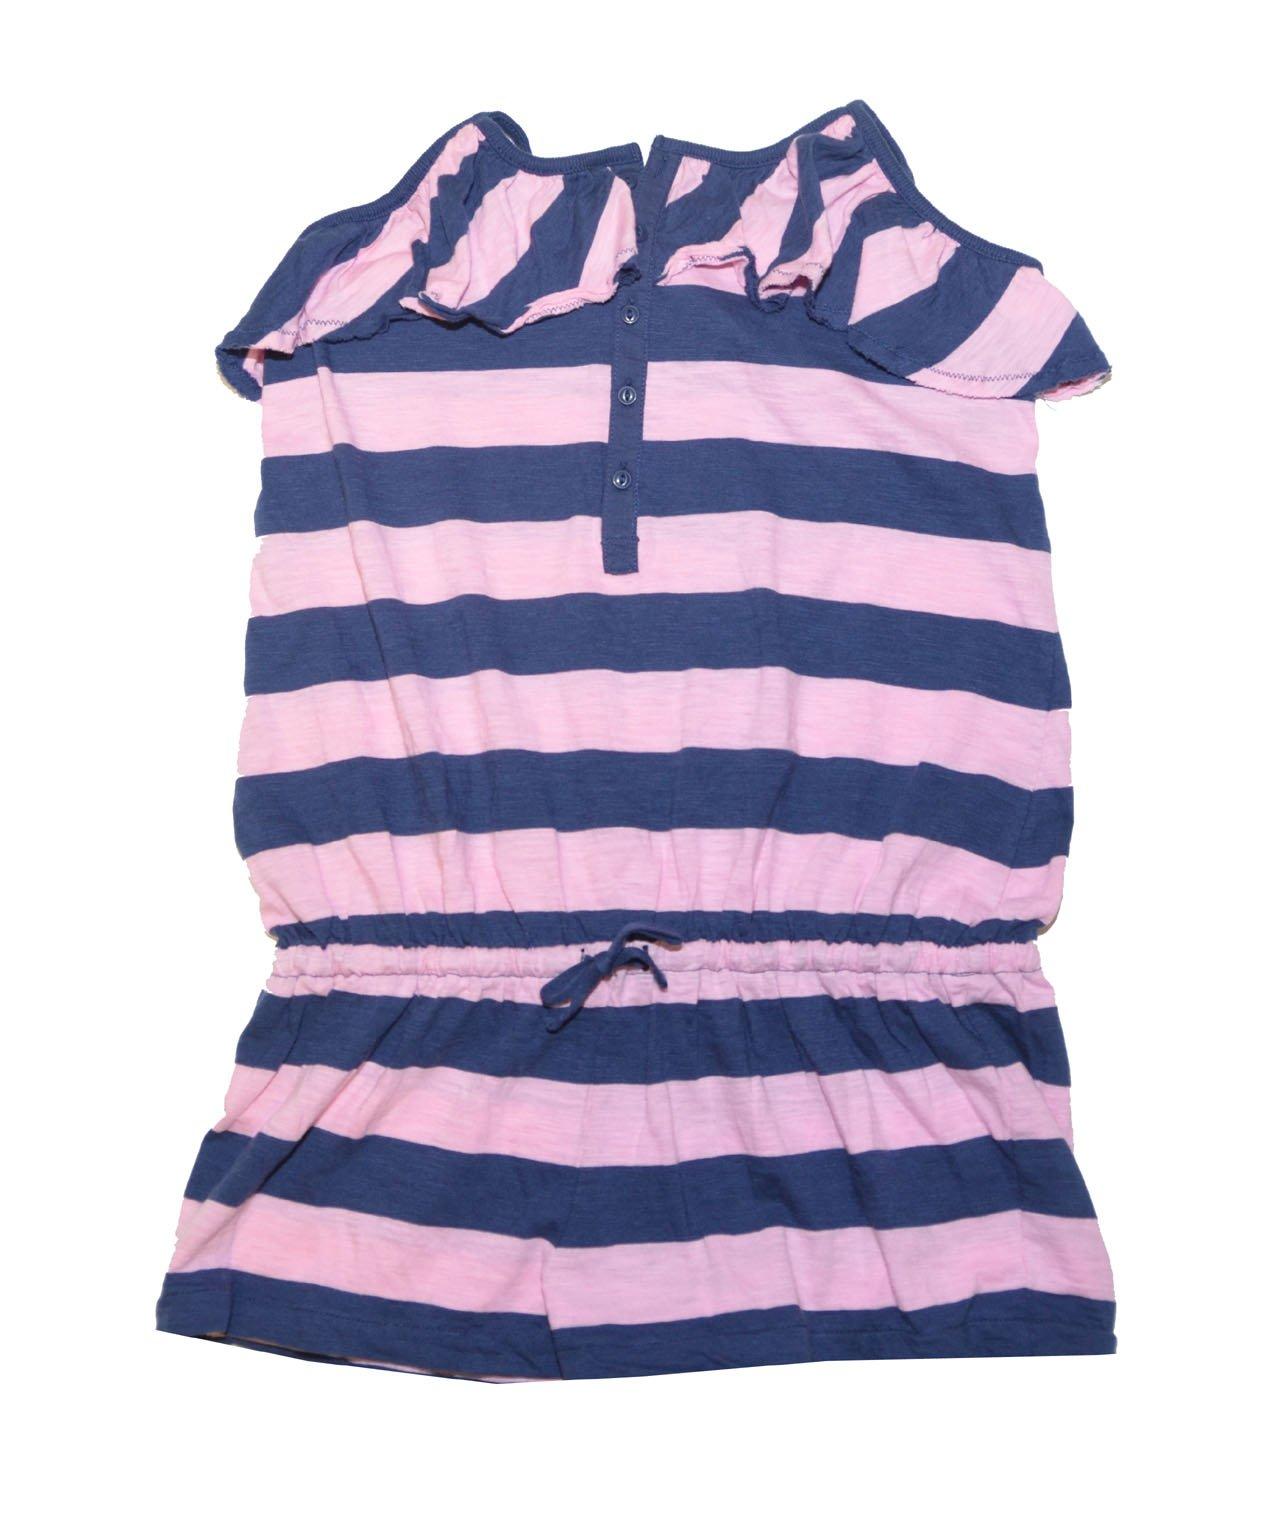 Ralph Lauren Girls Striped Ruffle Pony Logo Romper (M(8-10), Pink/navy)